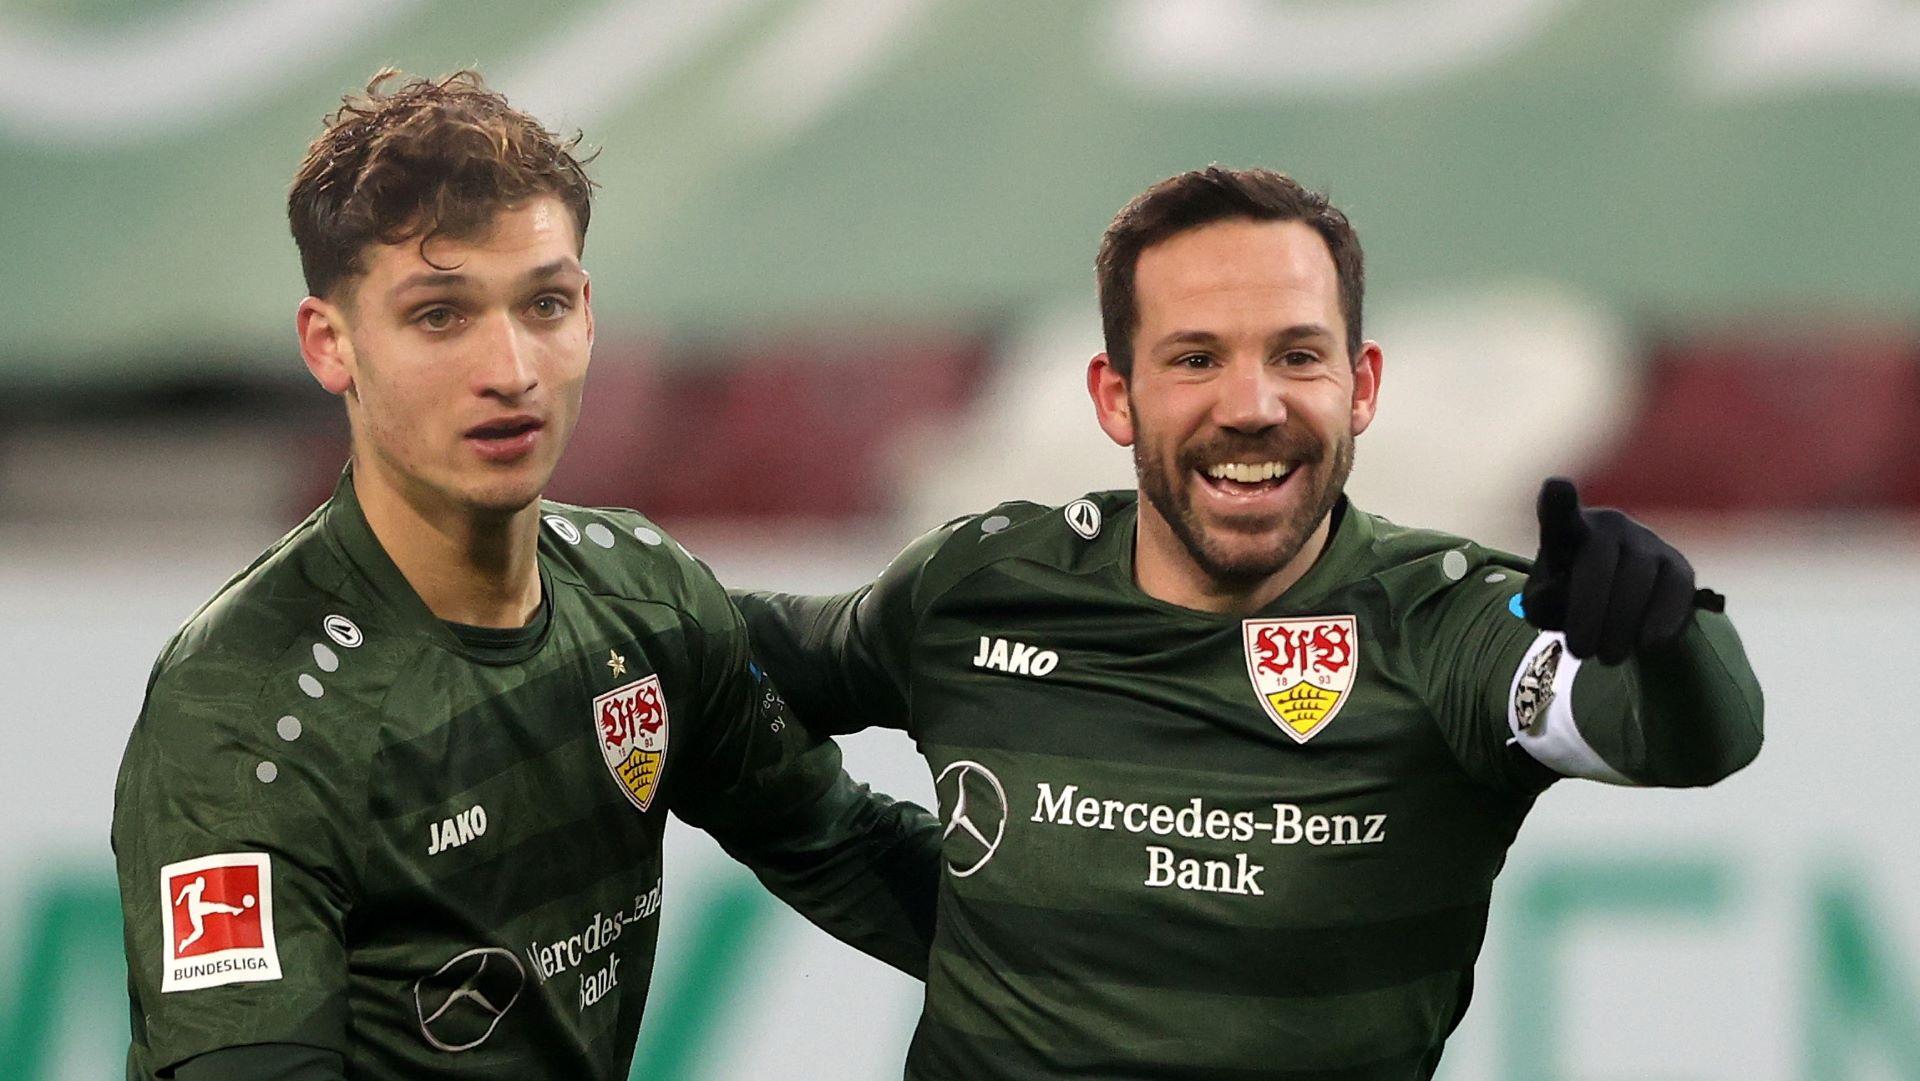 VfB Stuttgart Mainz 05 Bundesliga Castro Livestream